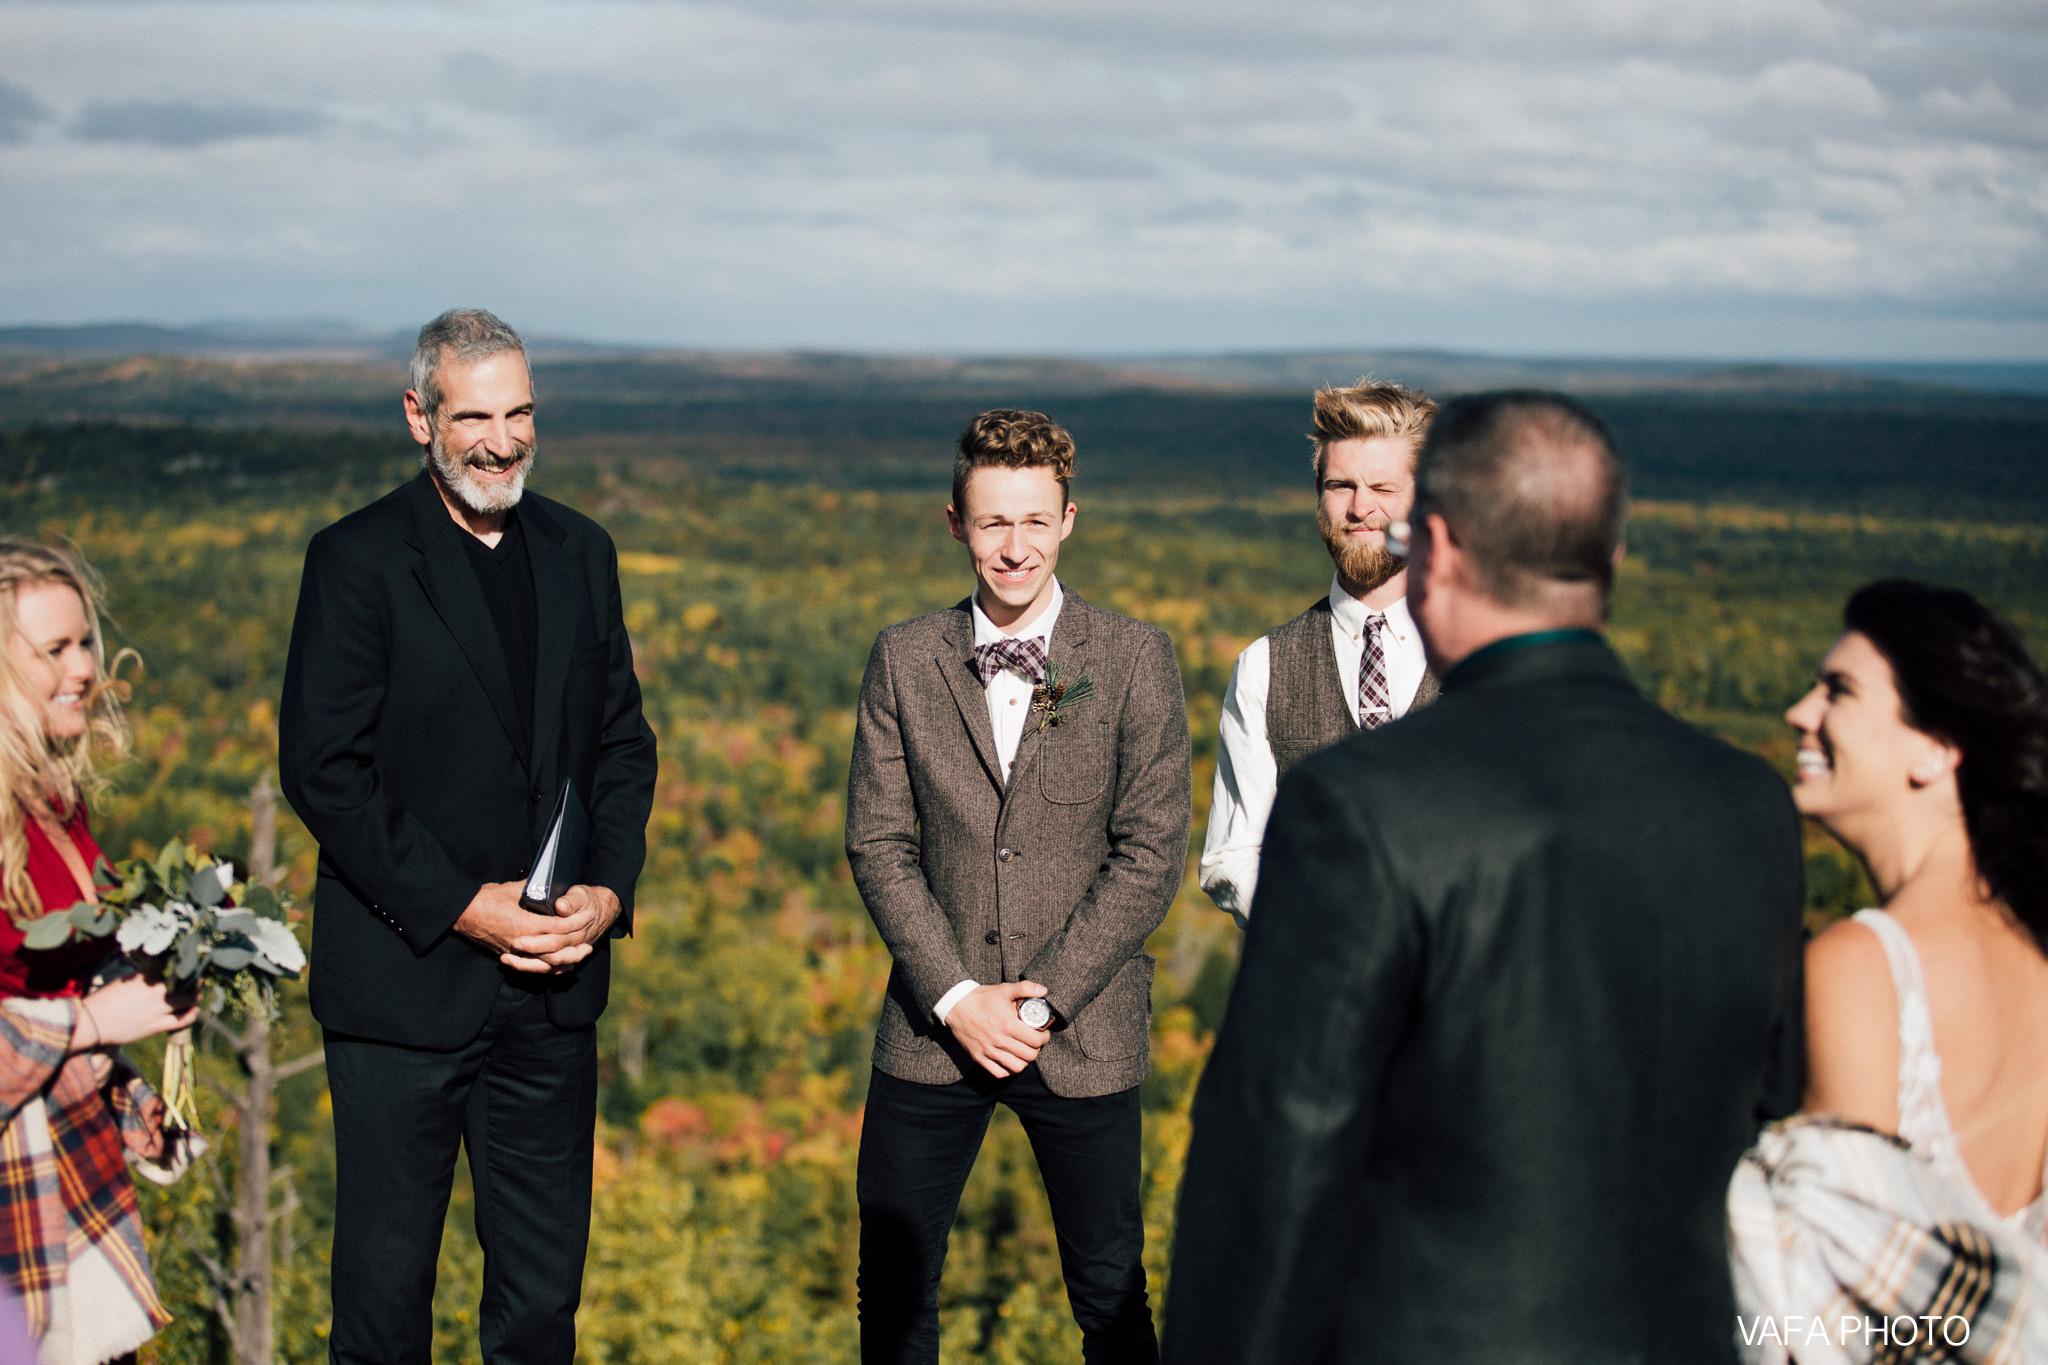 Hogback-Mountain-Wedding-Chelsea-Josh-Vafa-Photo-189.jpg